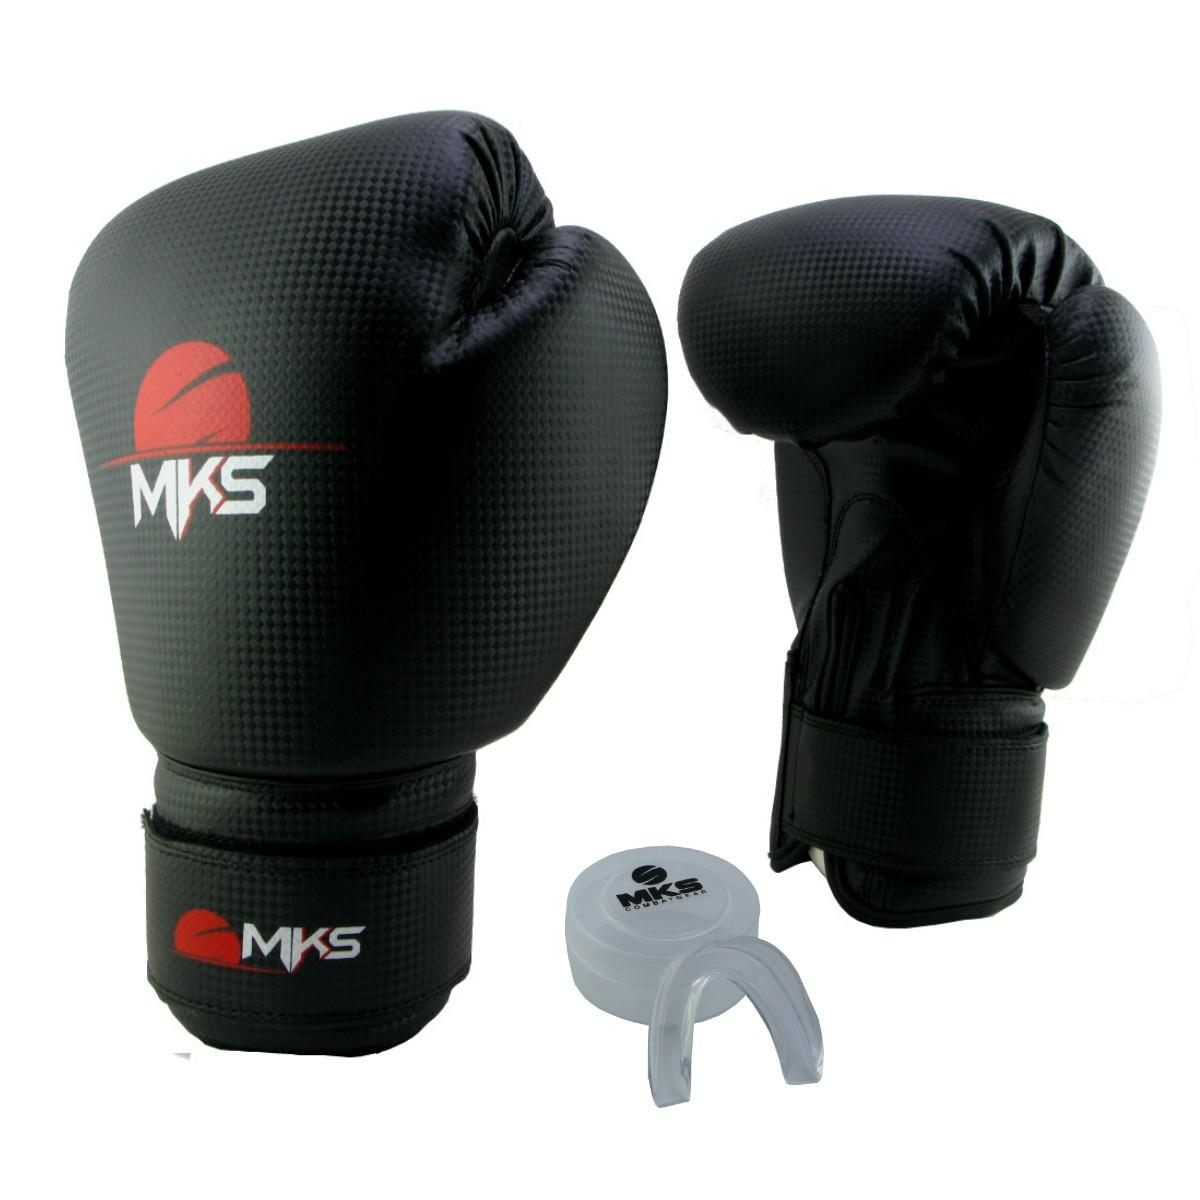 Luva de Boxe Prospect MKS Preta 12 oz + Protetor Bucal